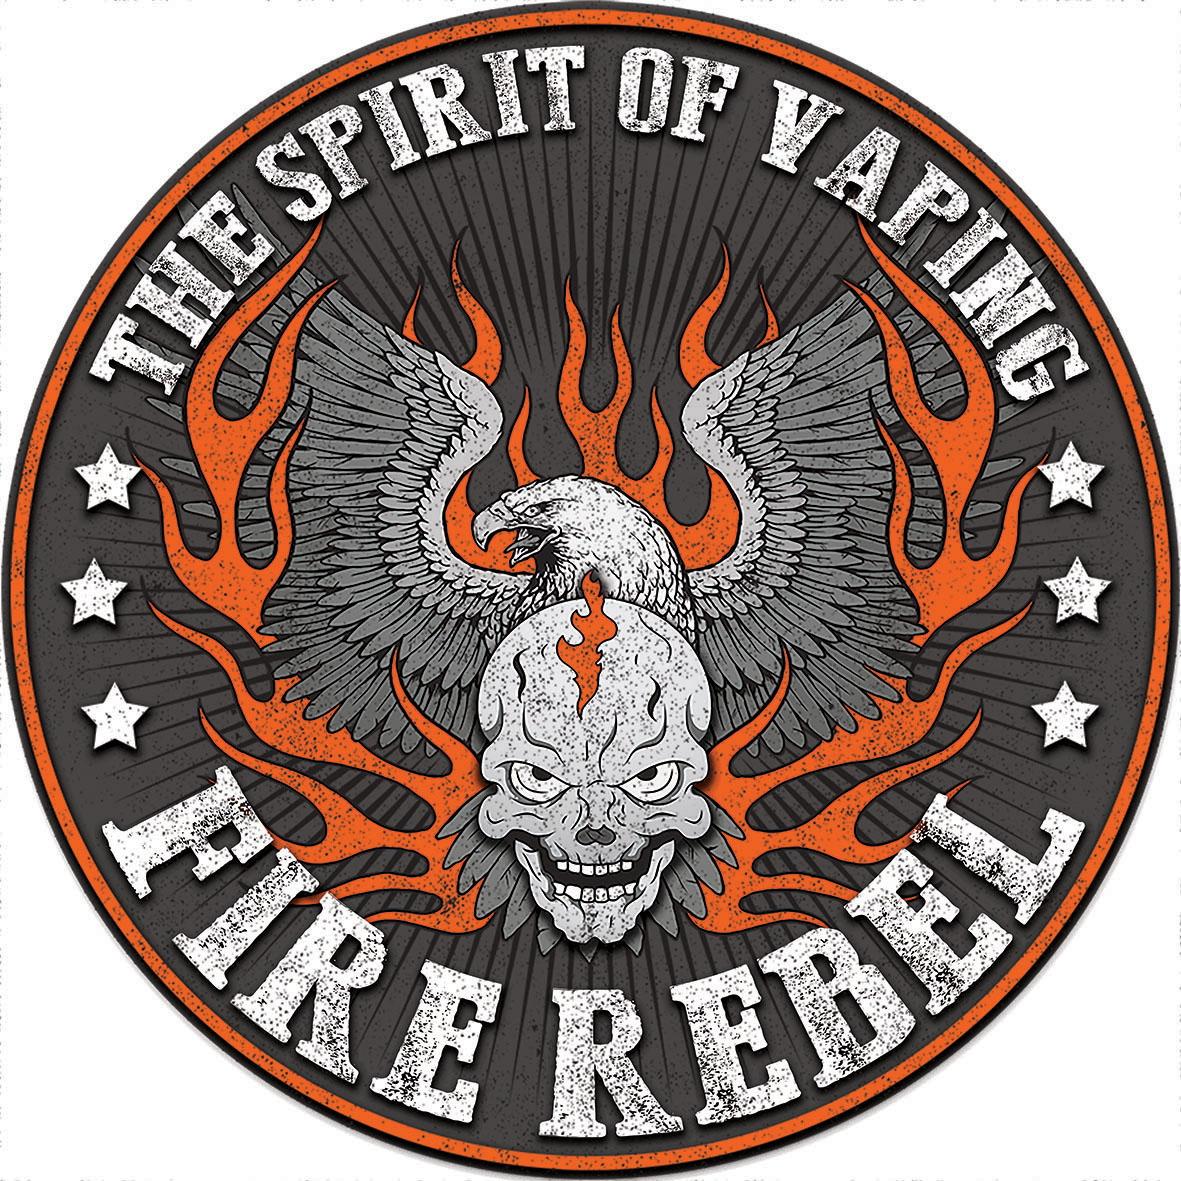 Fire Rebel 25ml – £0.50